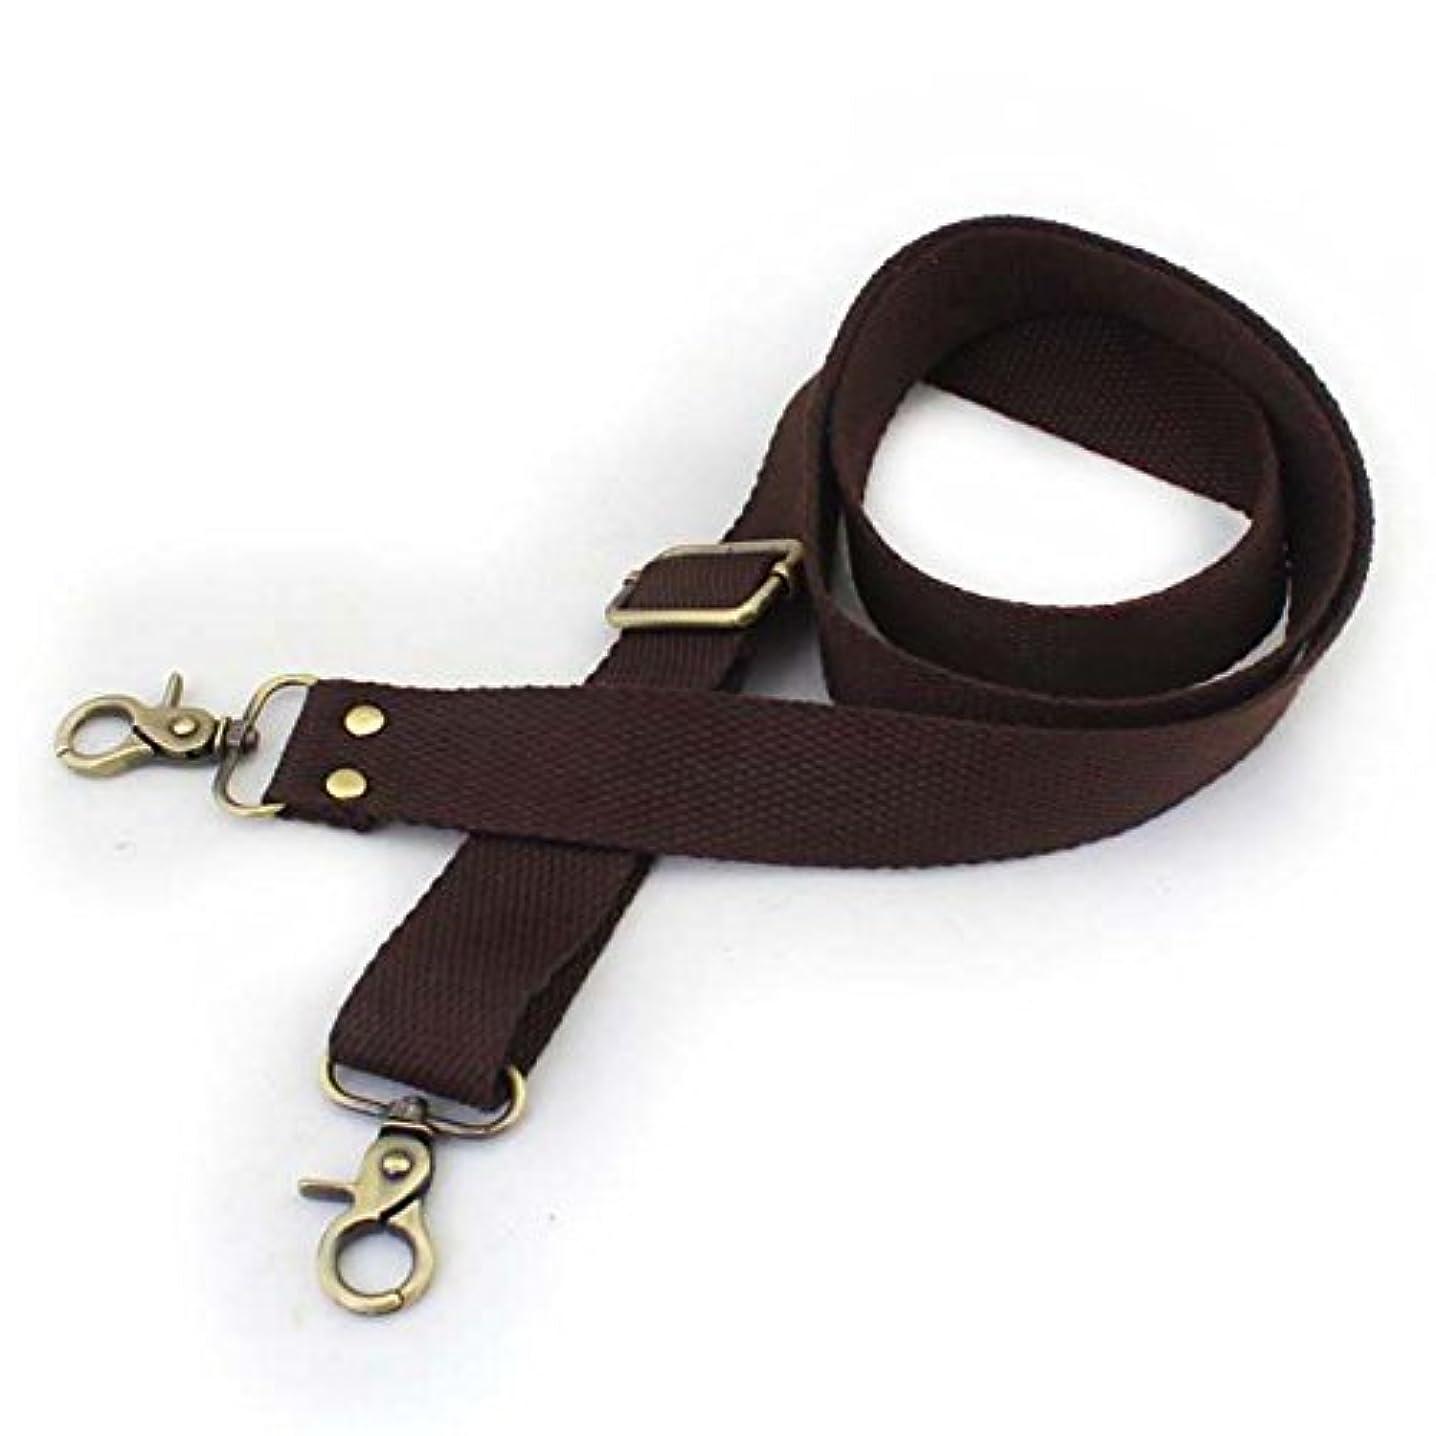 Wento 1pcs 31''-57'' Webbing Shoulder Cross Dark Brown Bag Strap,Replacement Cross Body Purse Straps,Dark Brown Canvas Purses Straps WTD34 (Dark Brown)